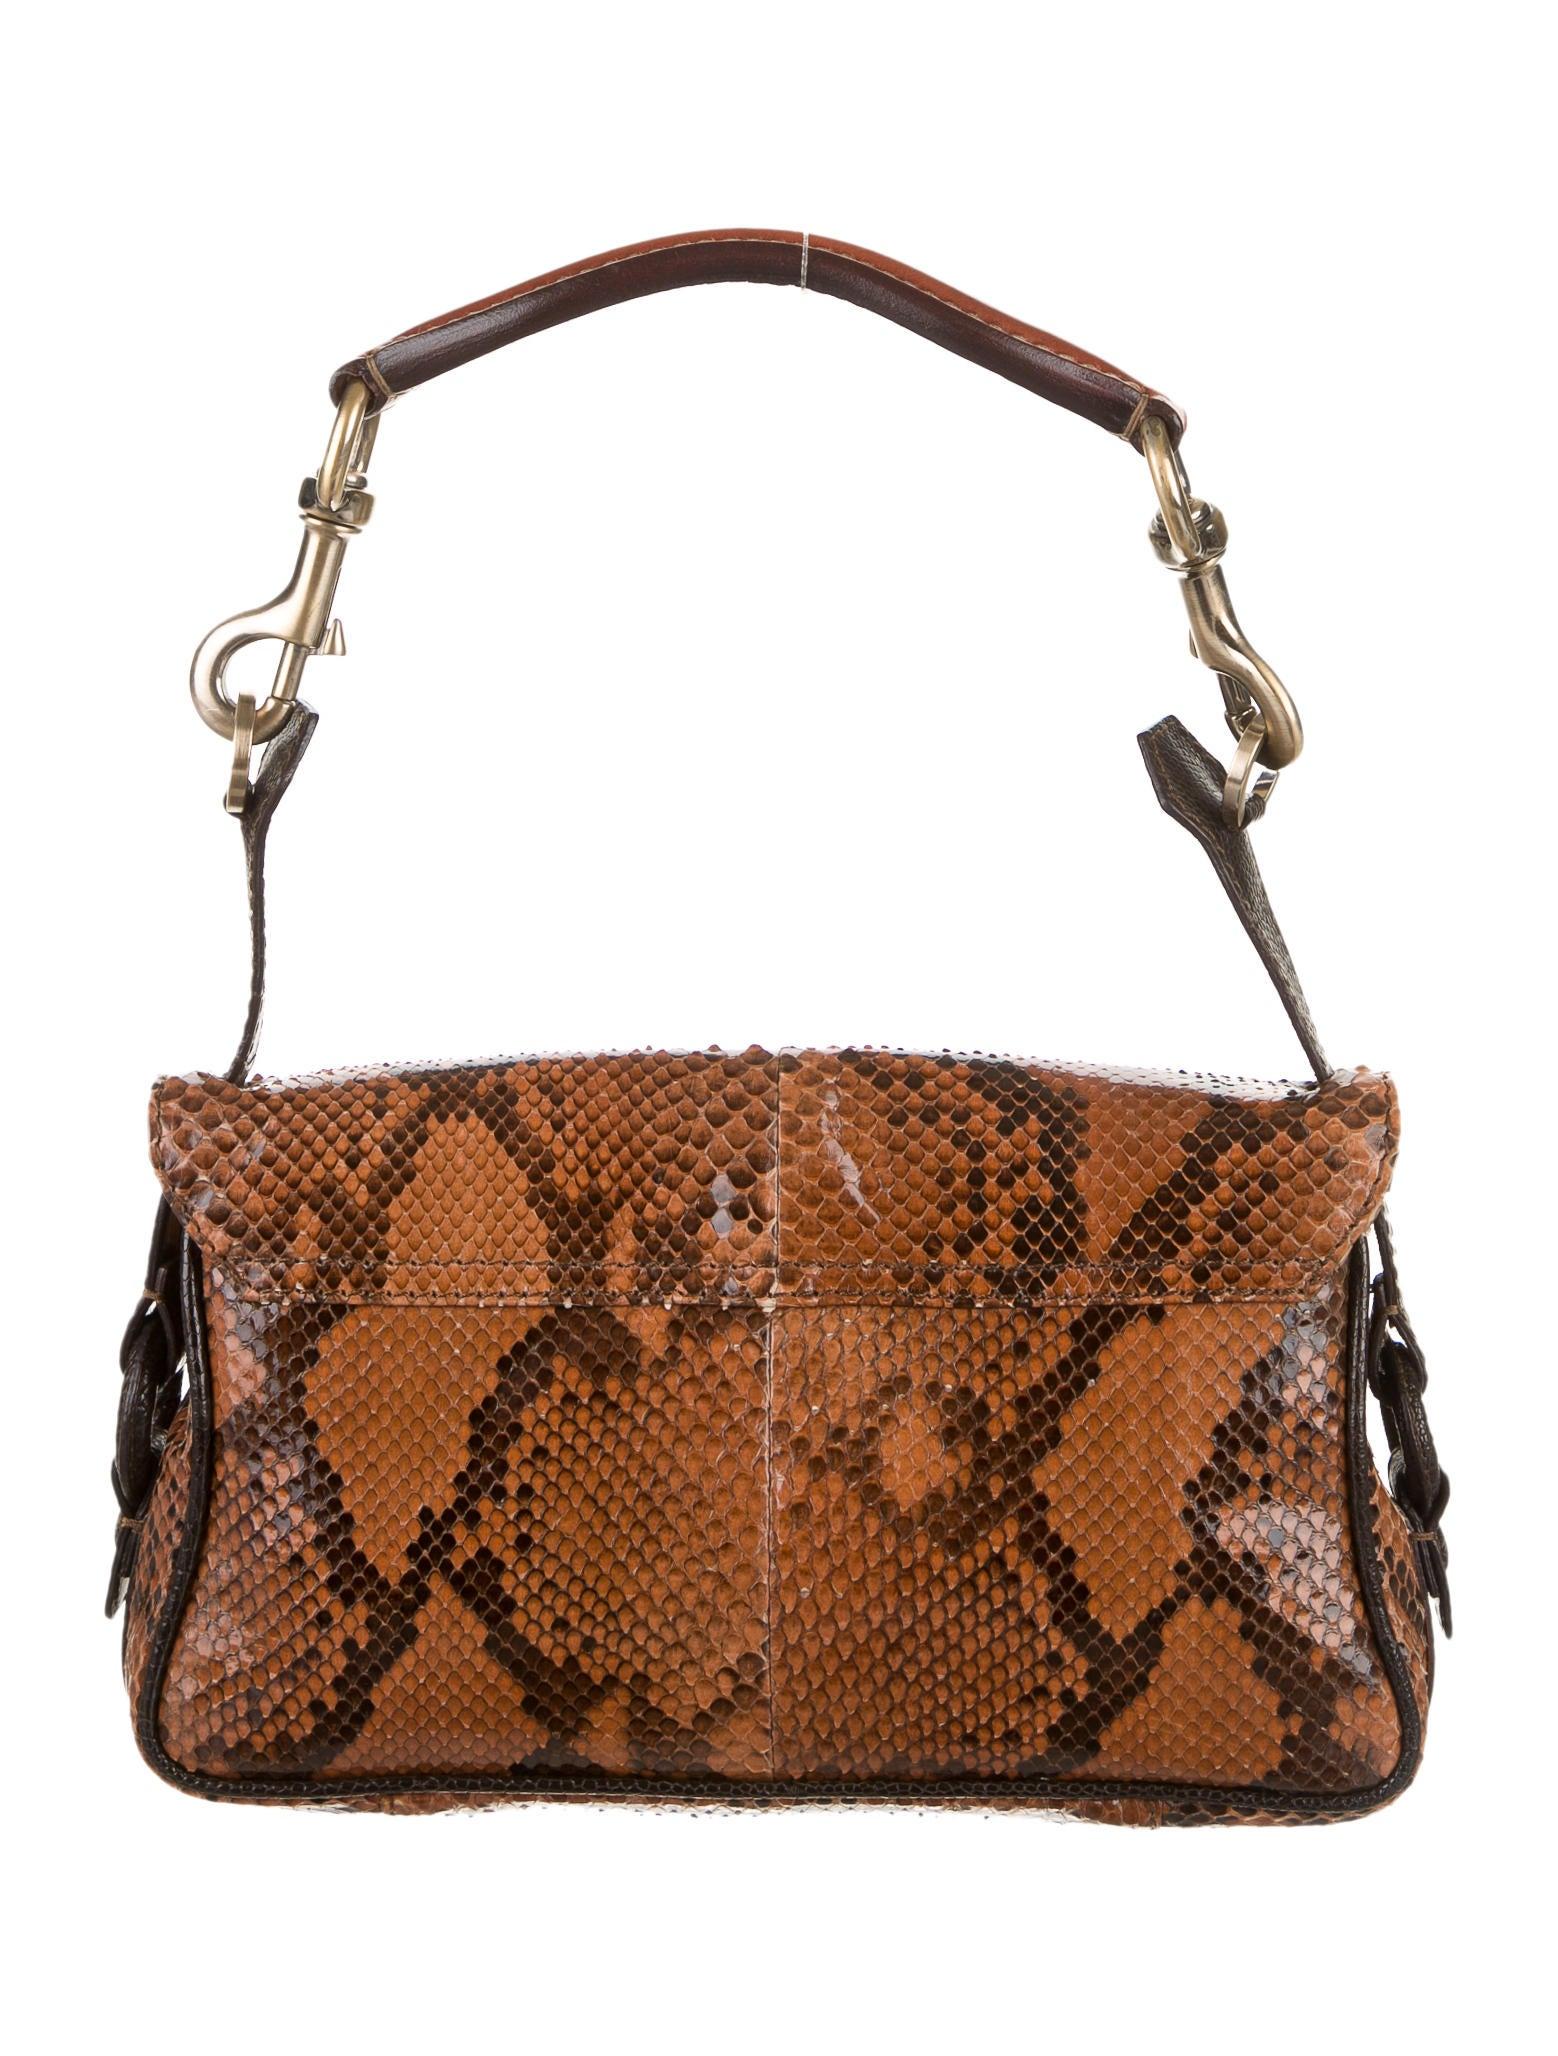 Valentino Python Shoulder Bag Handbags Val34723 The